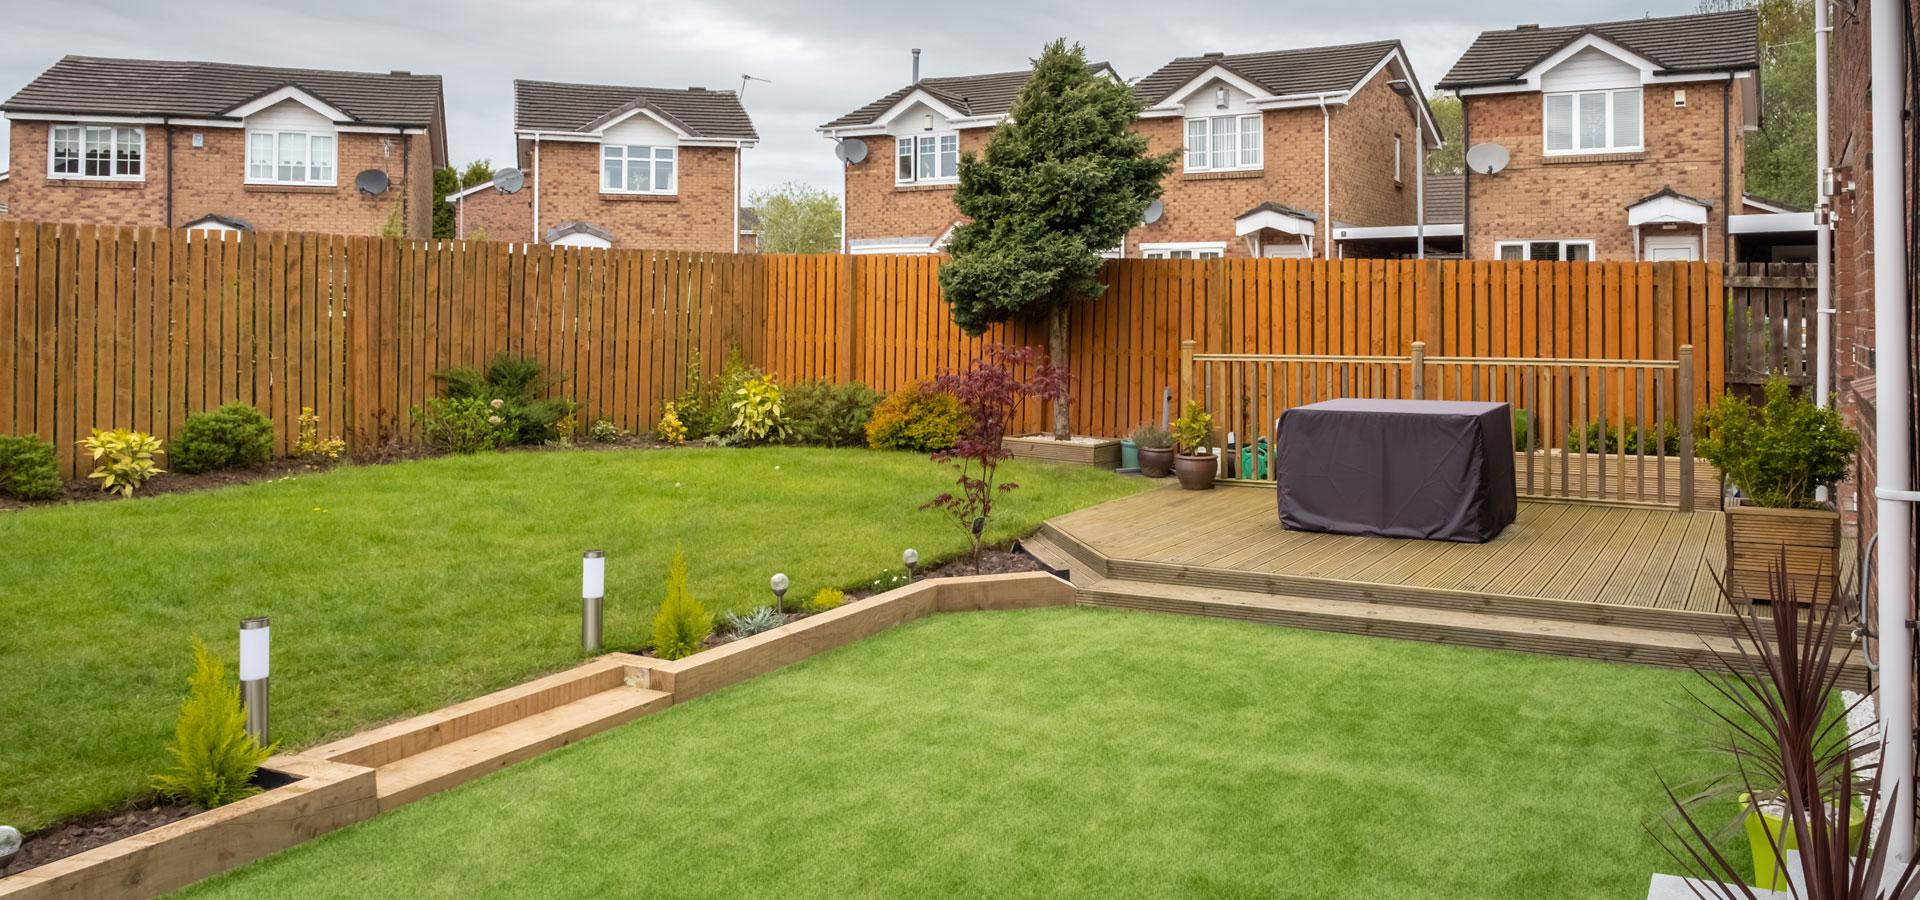 Garden Maintenance - Great North Landscaping